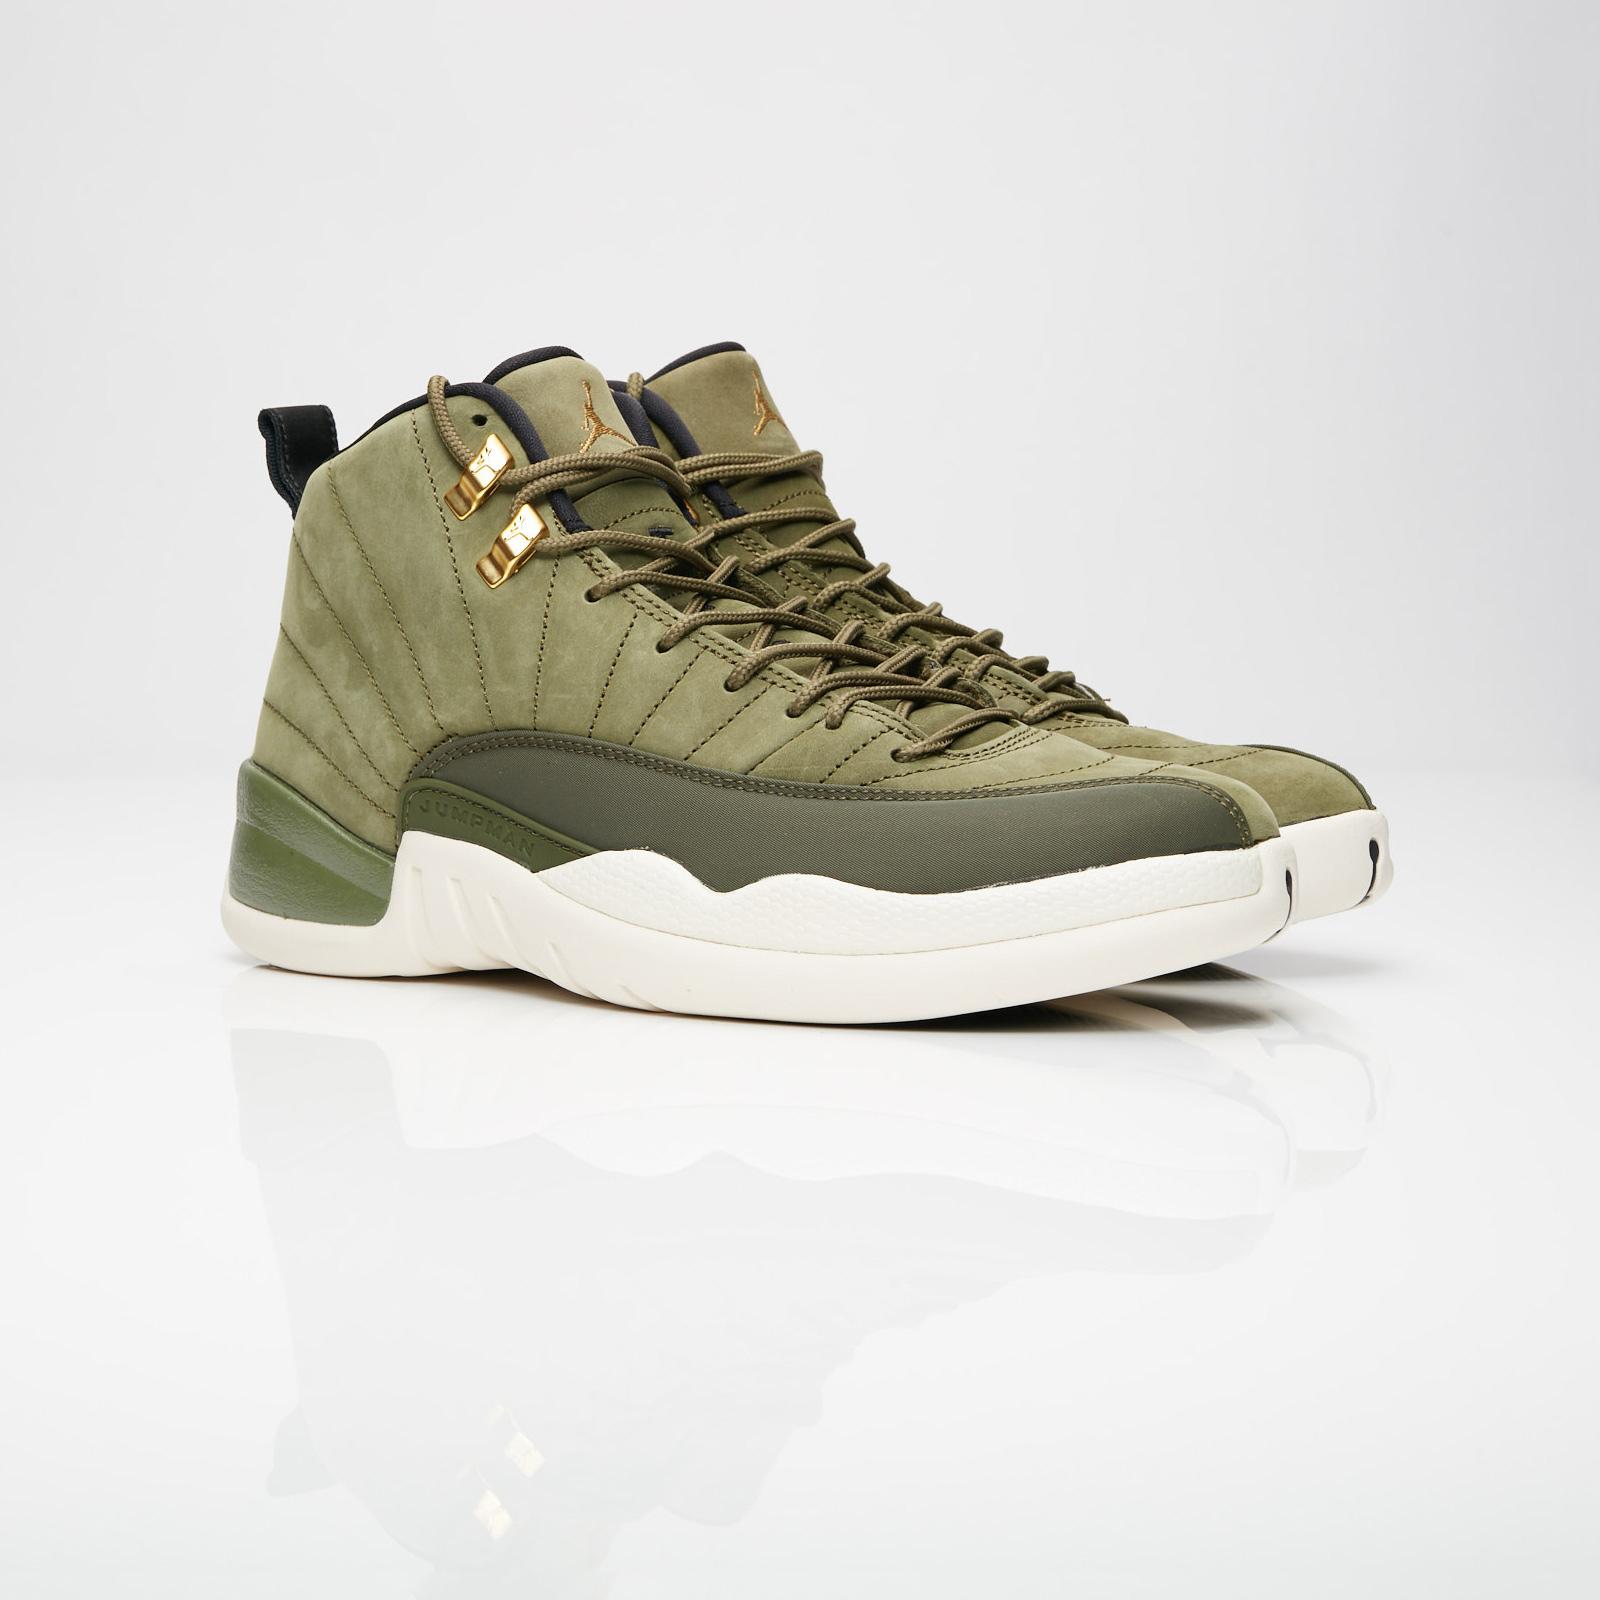 sale retailer 3d0ba 698d1 Jordan Brand Air Jordan 12 Retro - 130690-301 ...